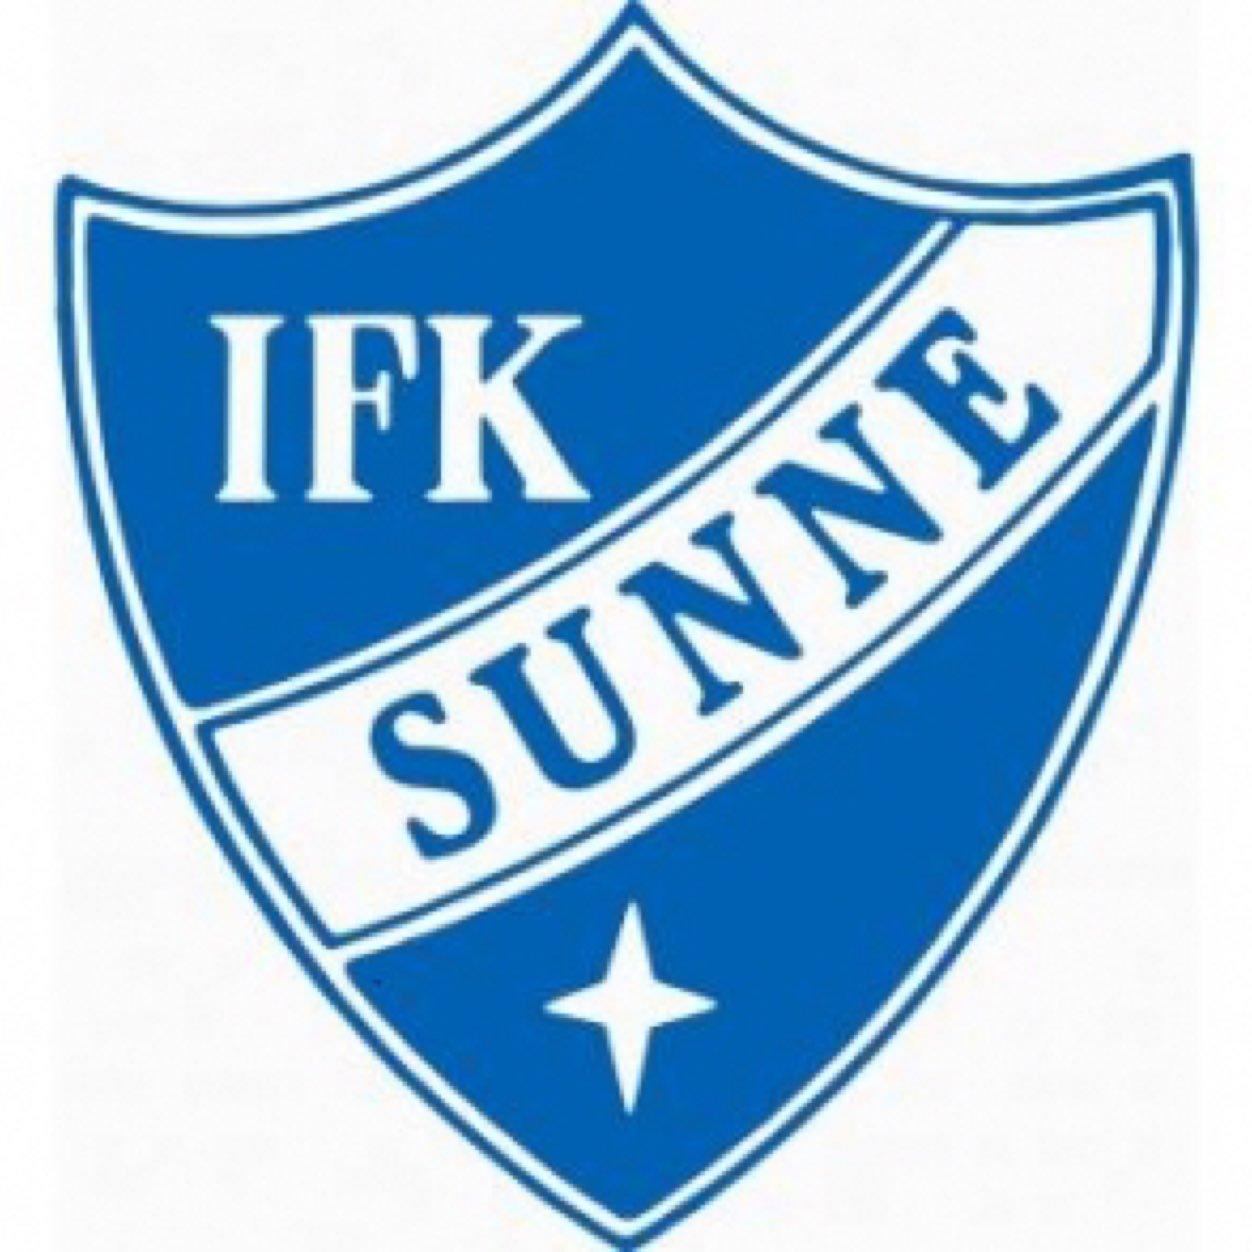 IFK Sunne Fotboll